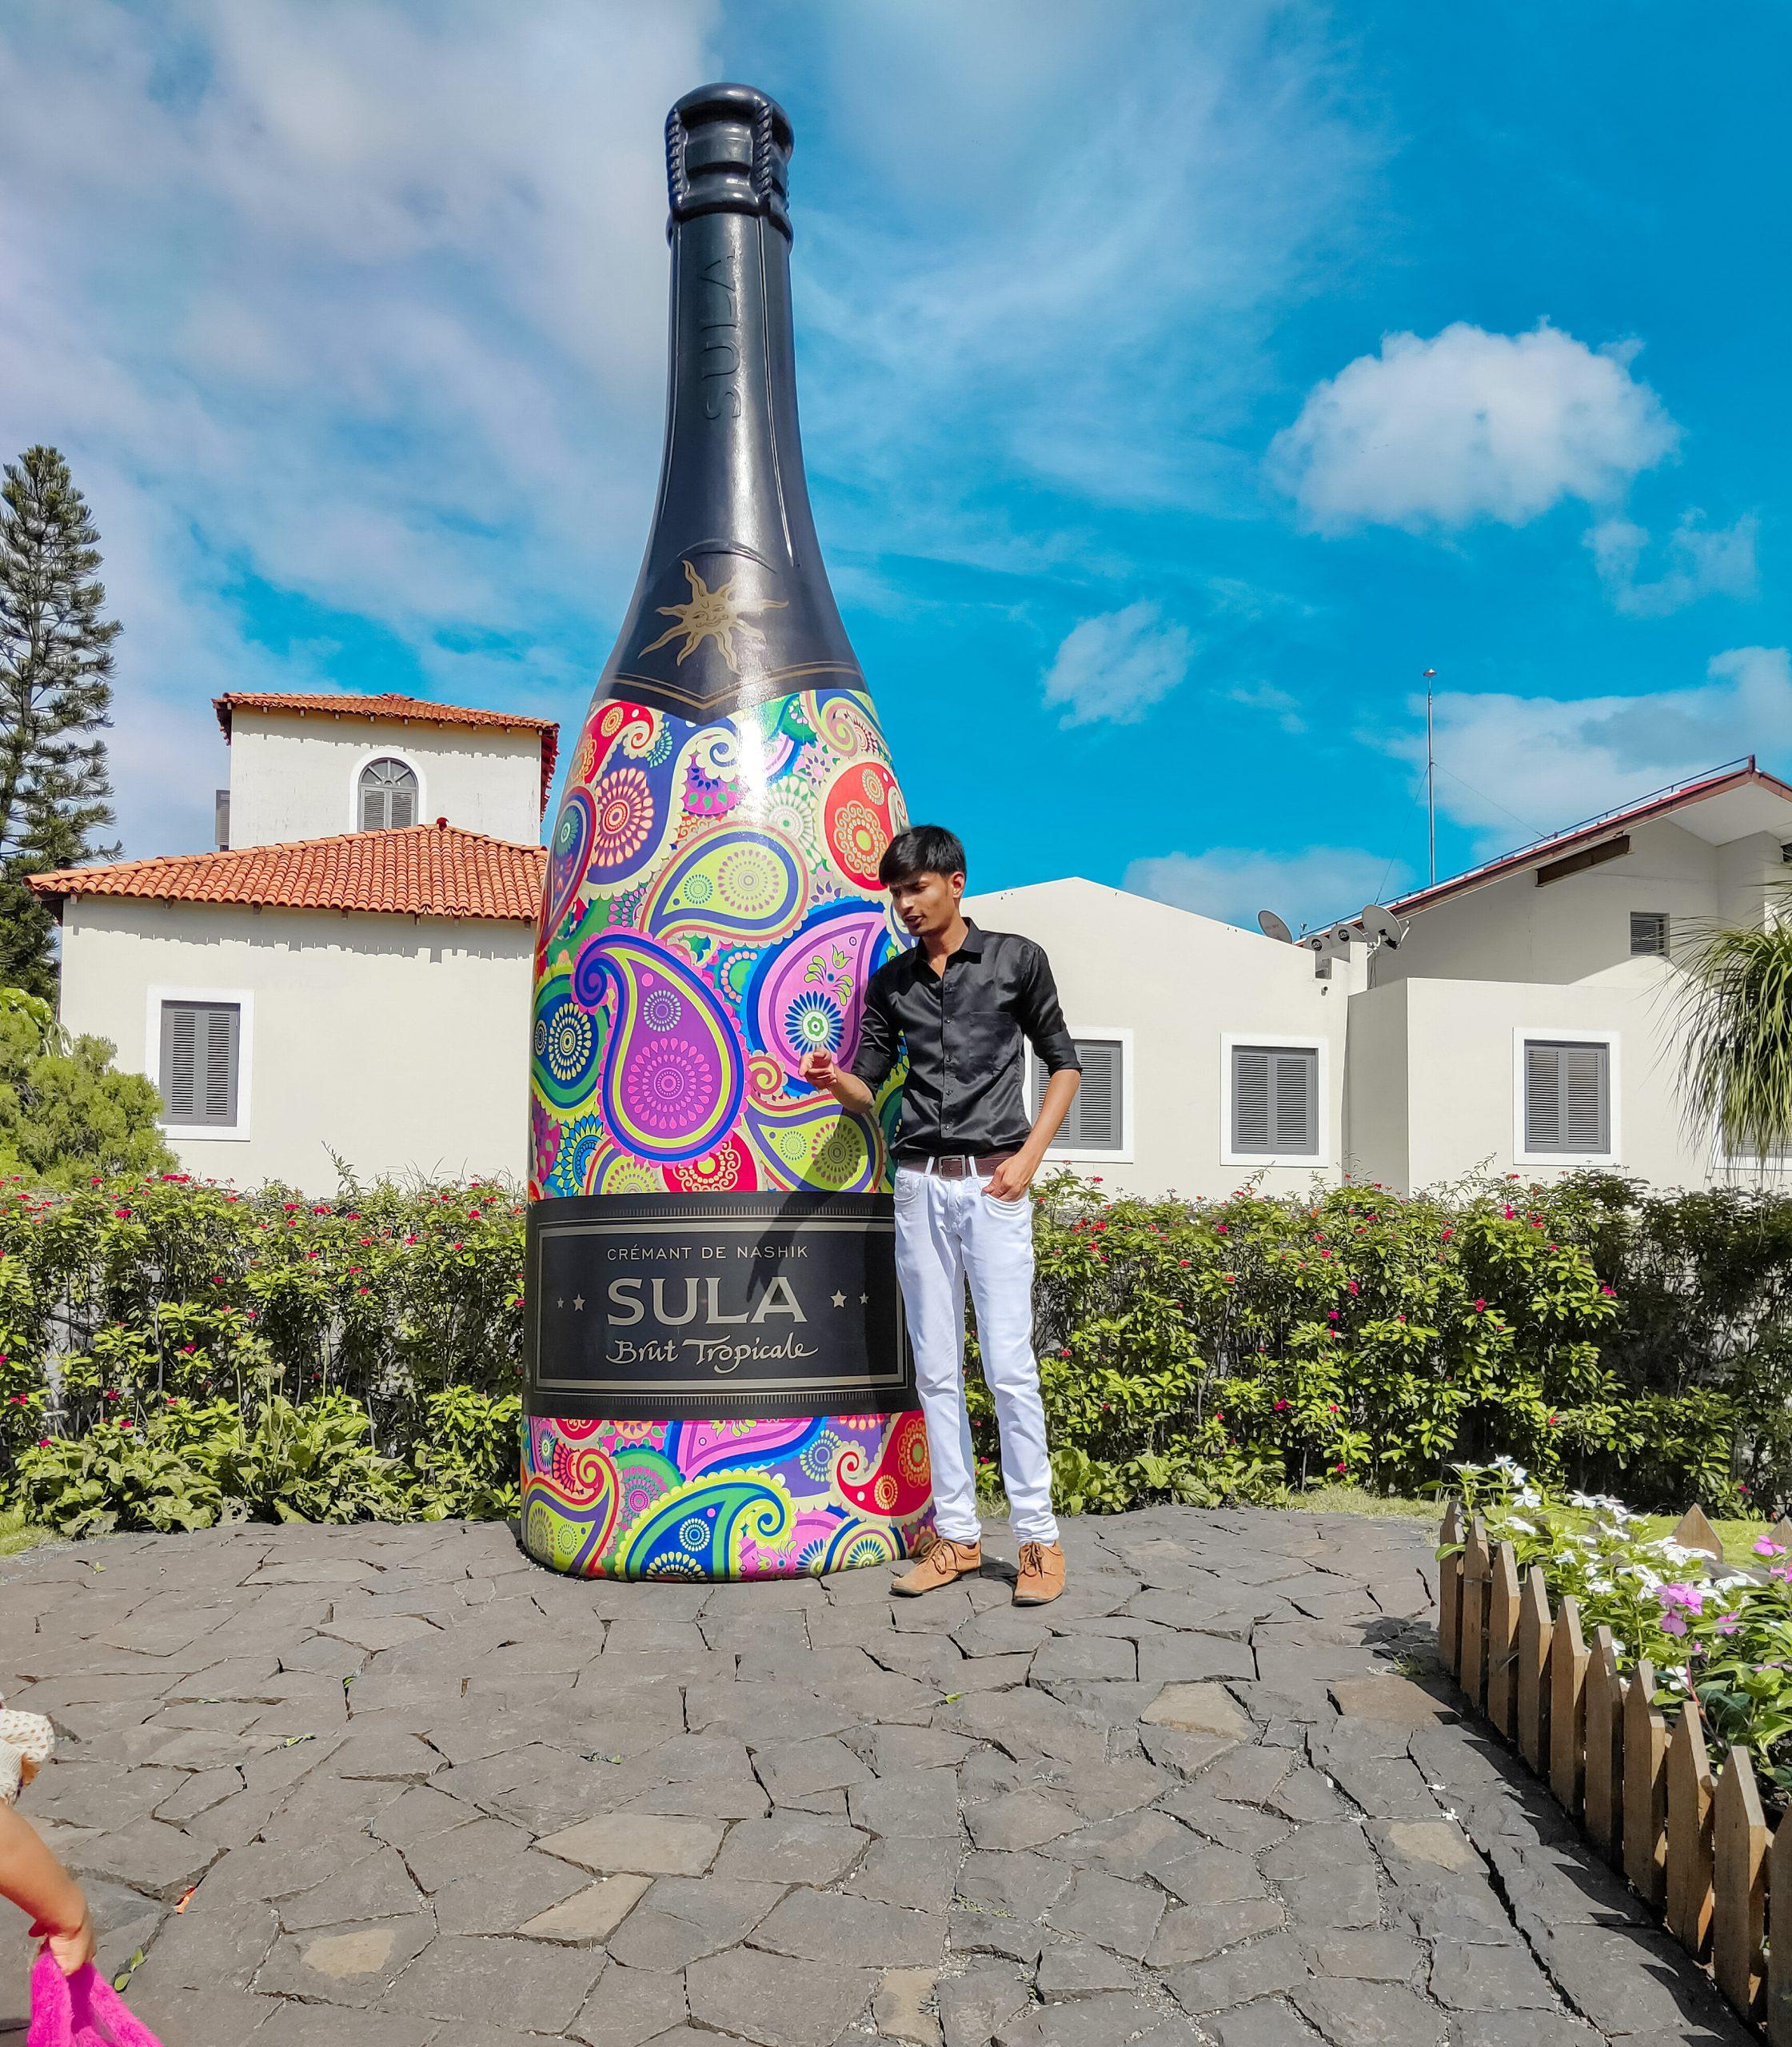 Boy posing in front of artificial bottle